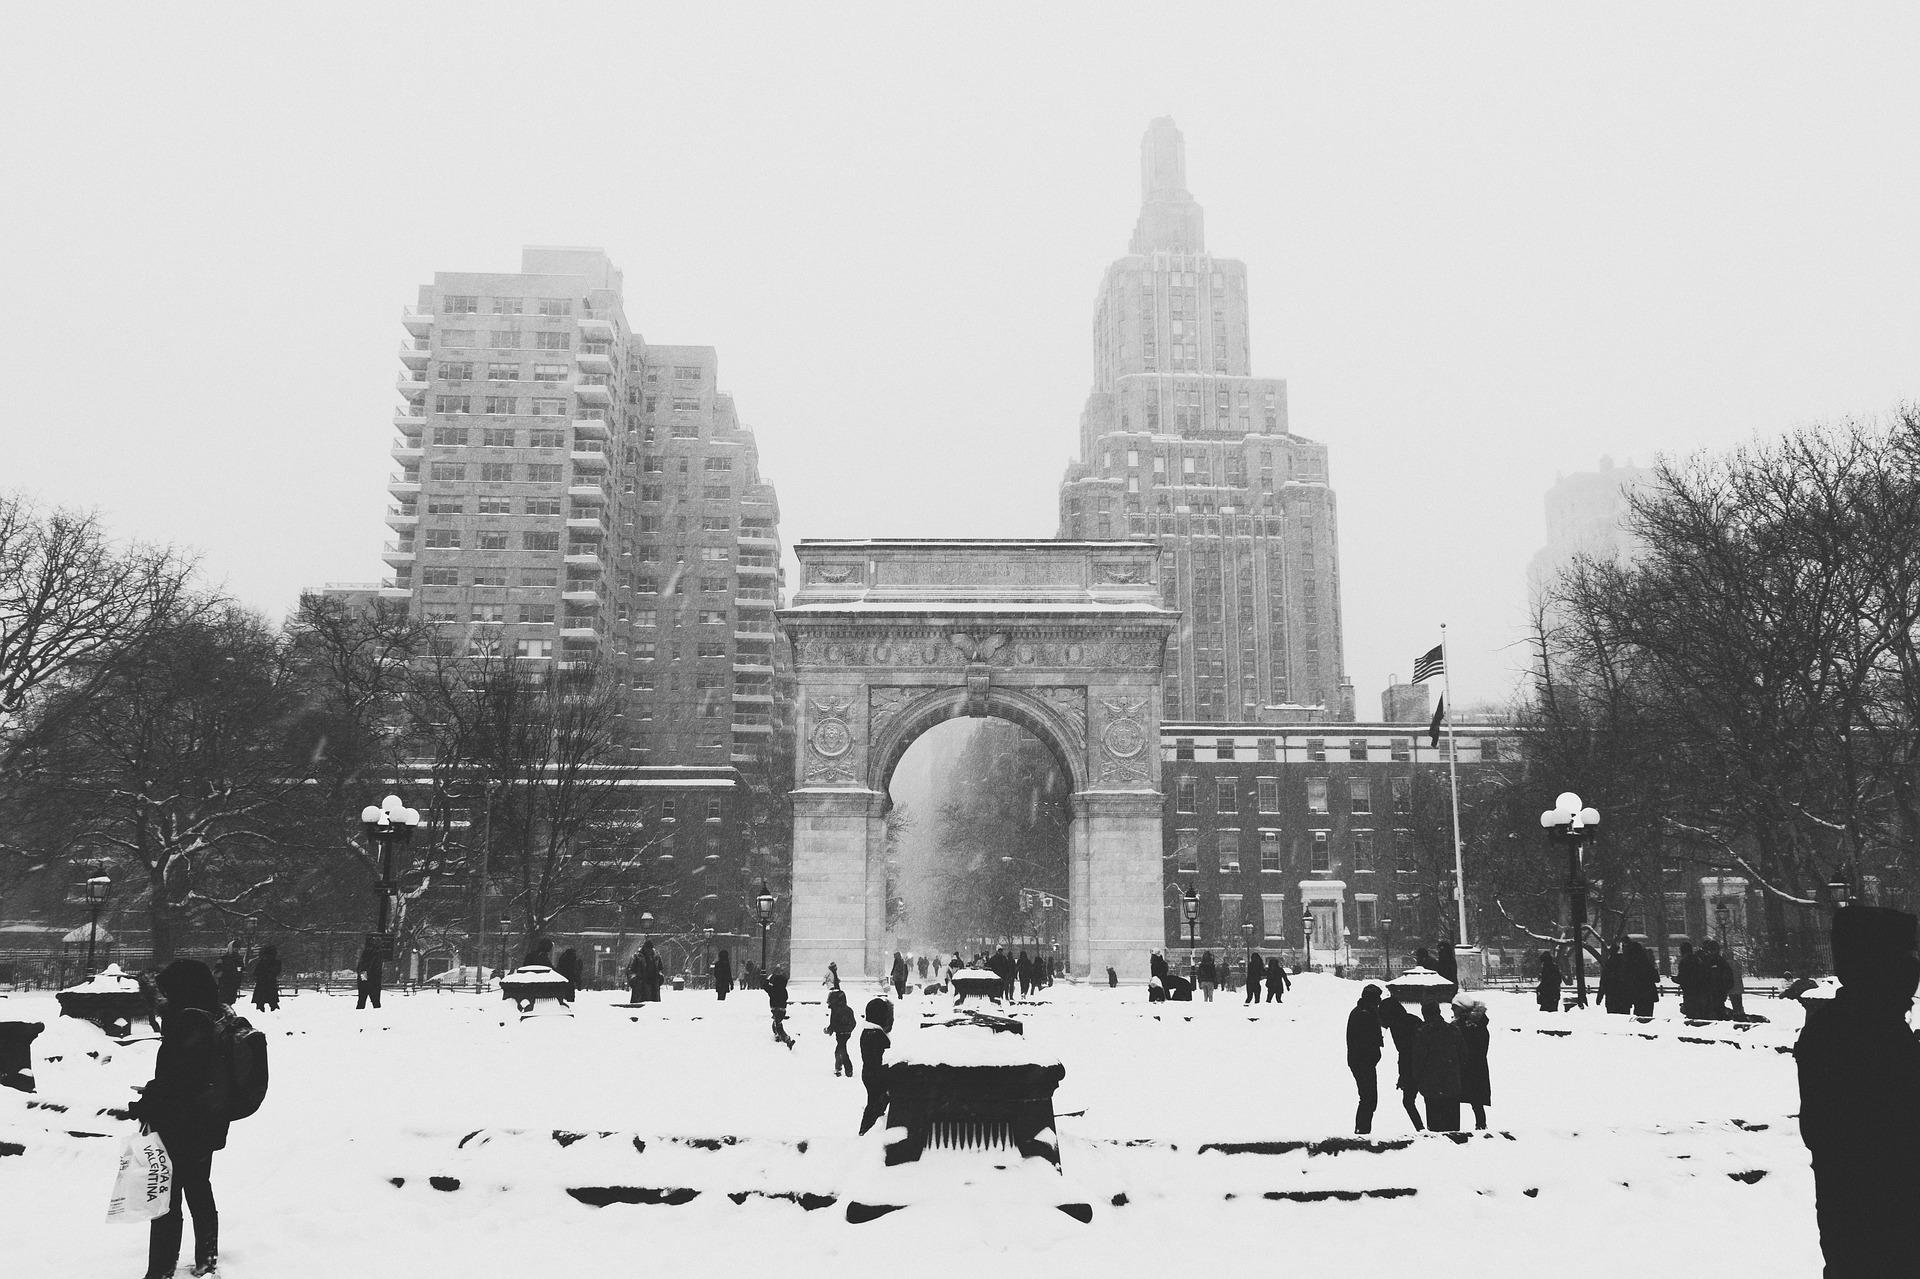 snow-1209872_1920